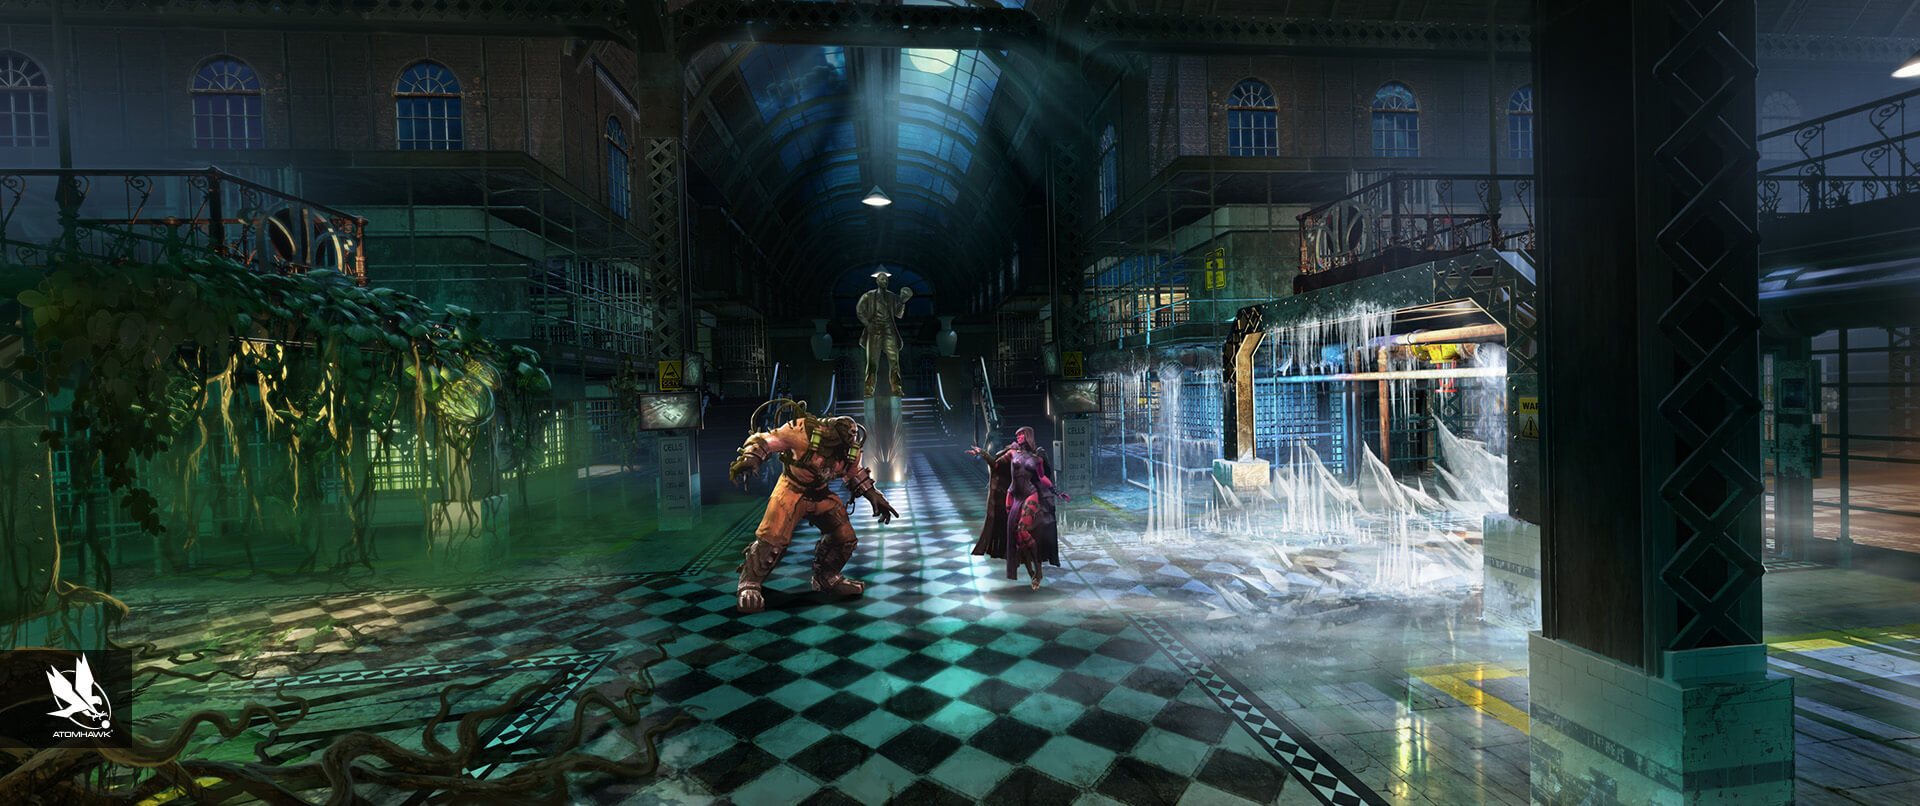 Environment Design - Injustice2 - Arkham Asylum